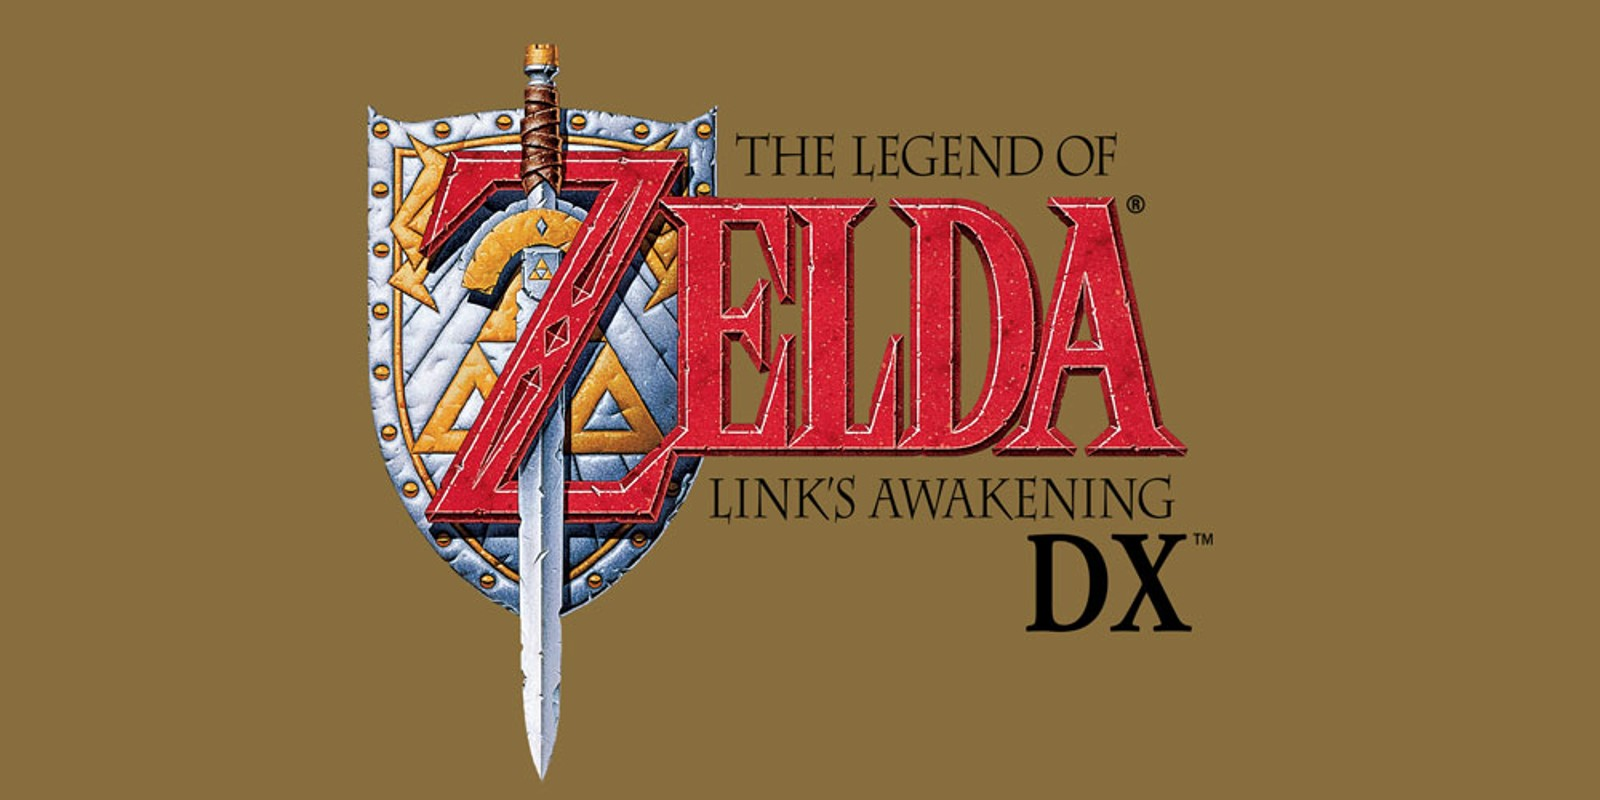 The Legend Of Zelda Links Awakening DX Game Boy